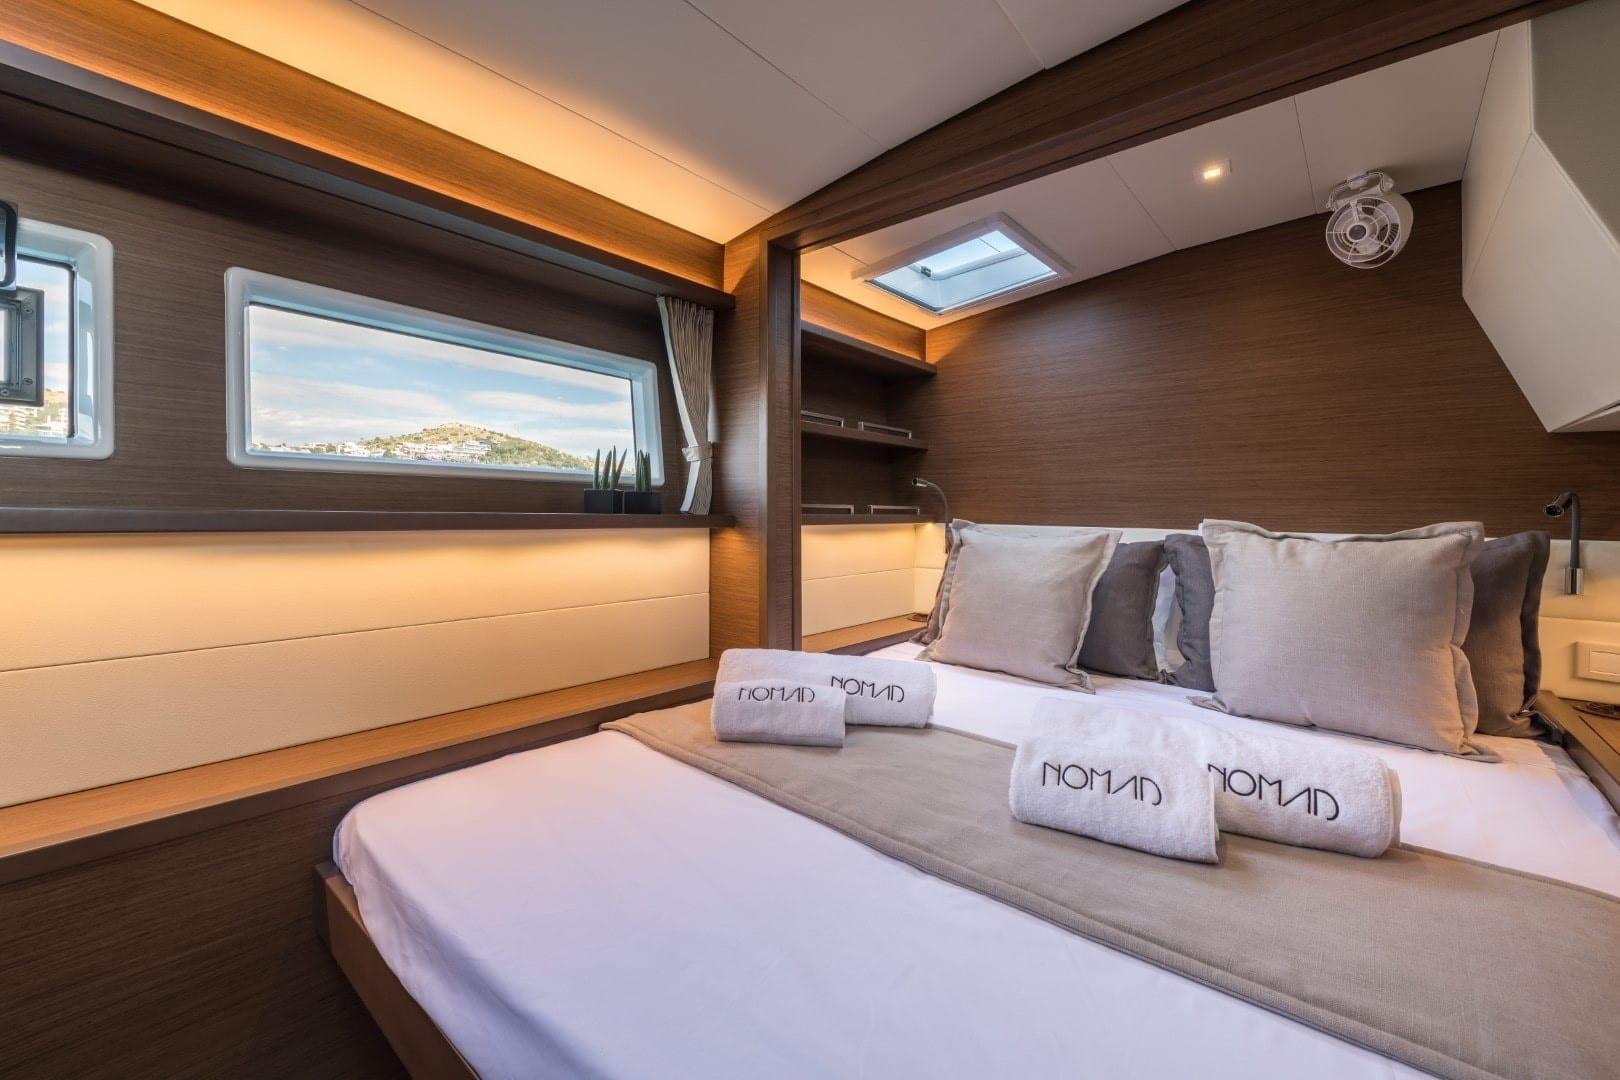 cabin of a catamaran